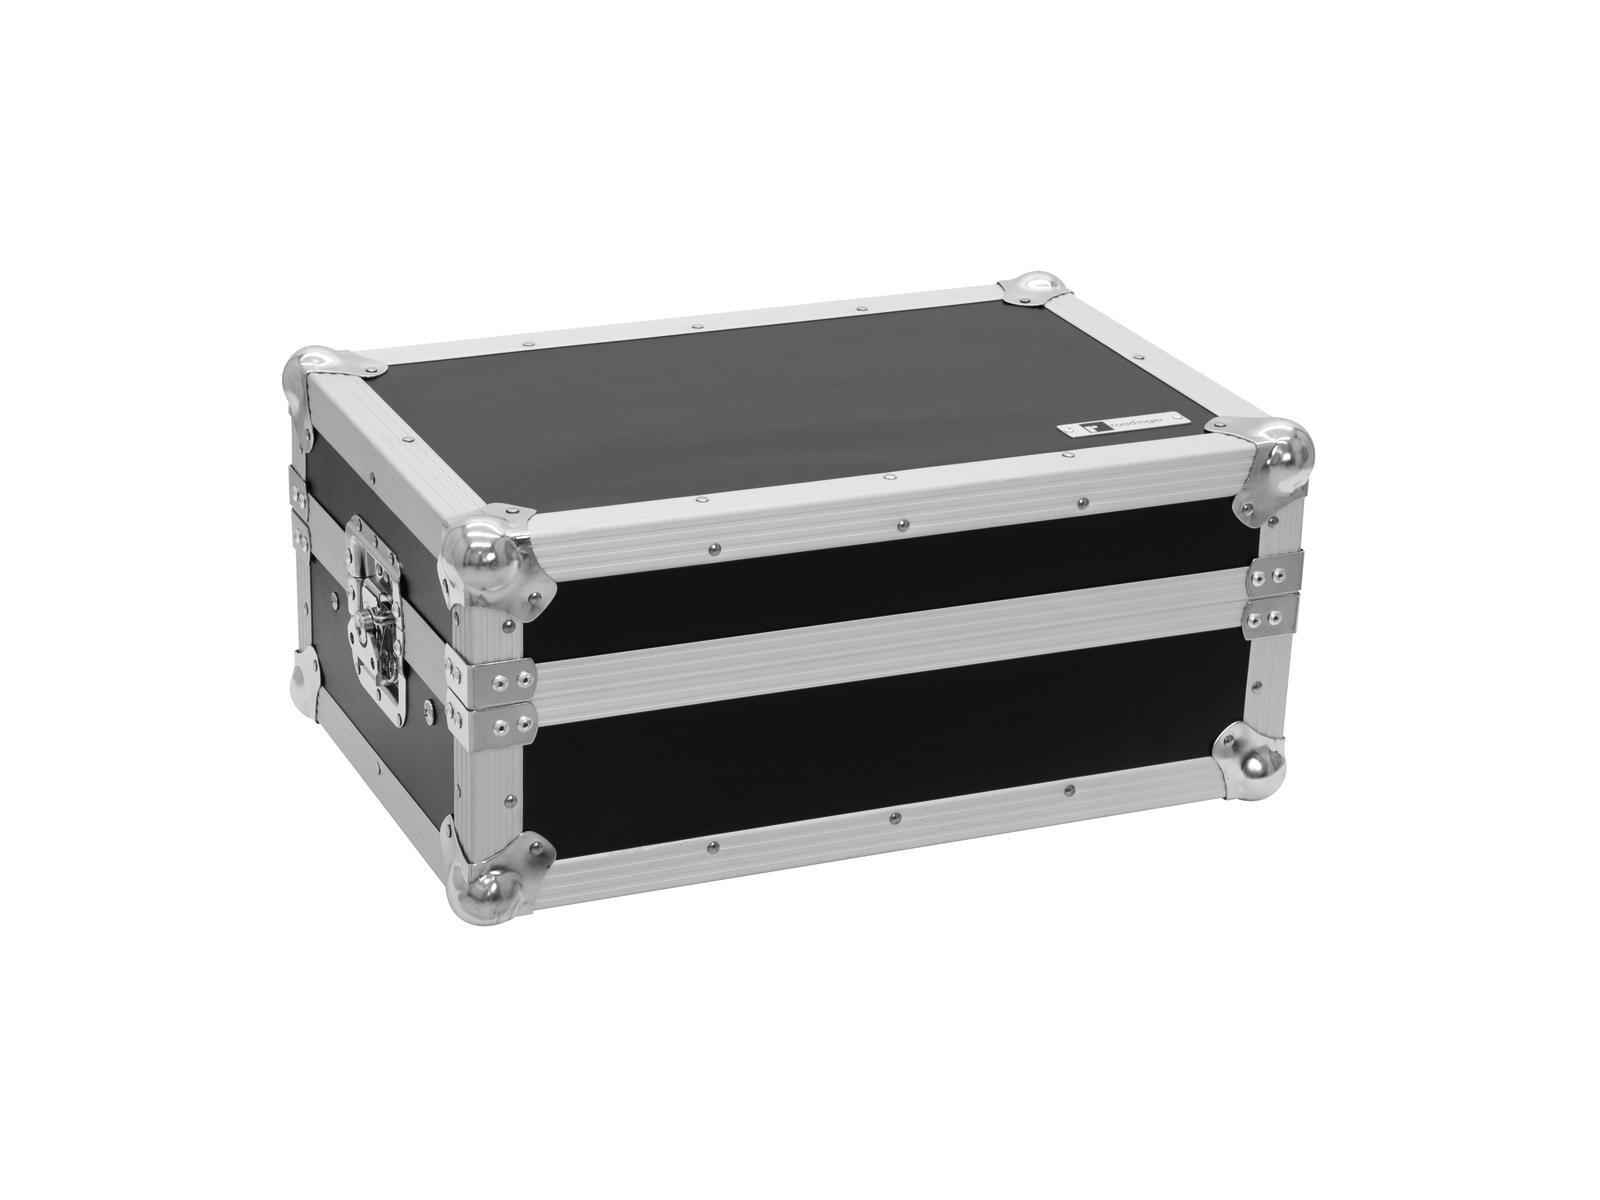 ROADINGER Mixer-Case Profi MCV-19, variabel, sw 6HE